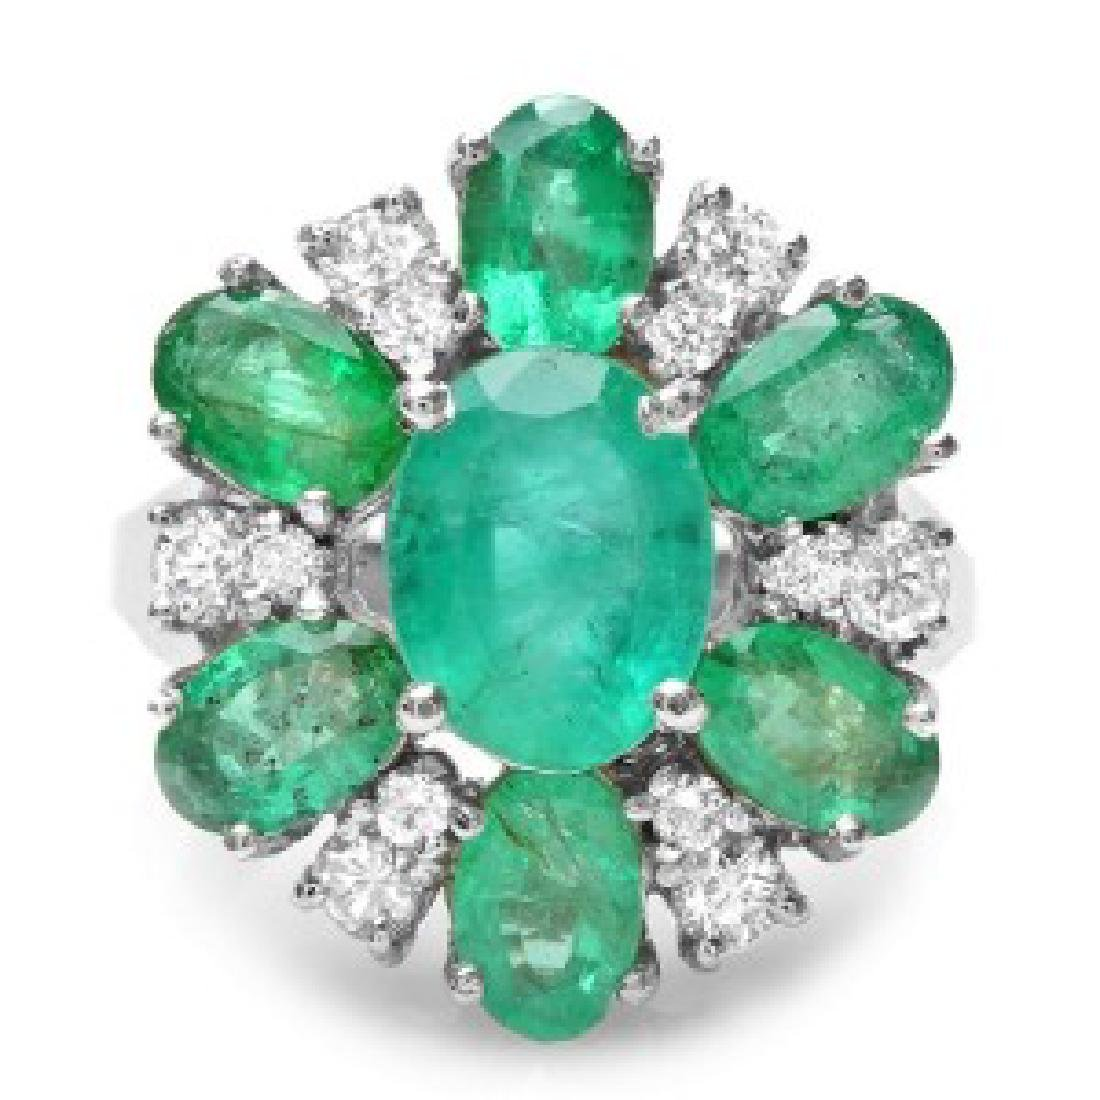 4.36 Carat Natural Emerald 18K Solid White Gold Diamond - 2